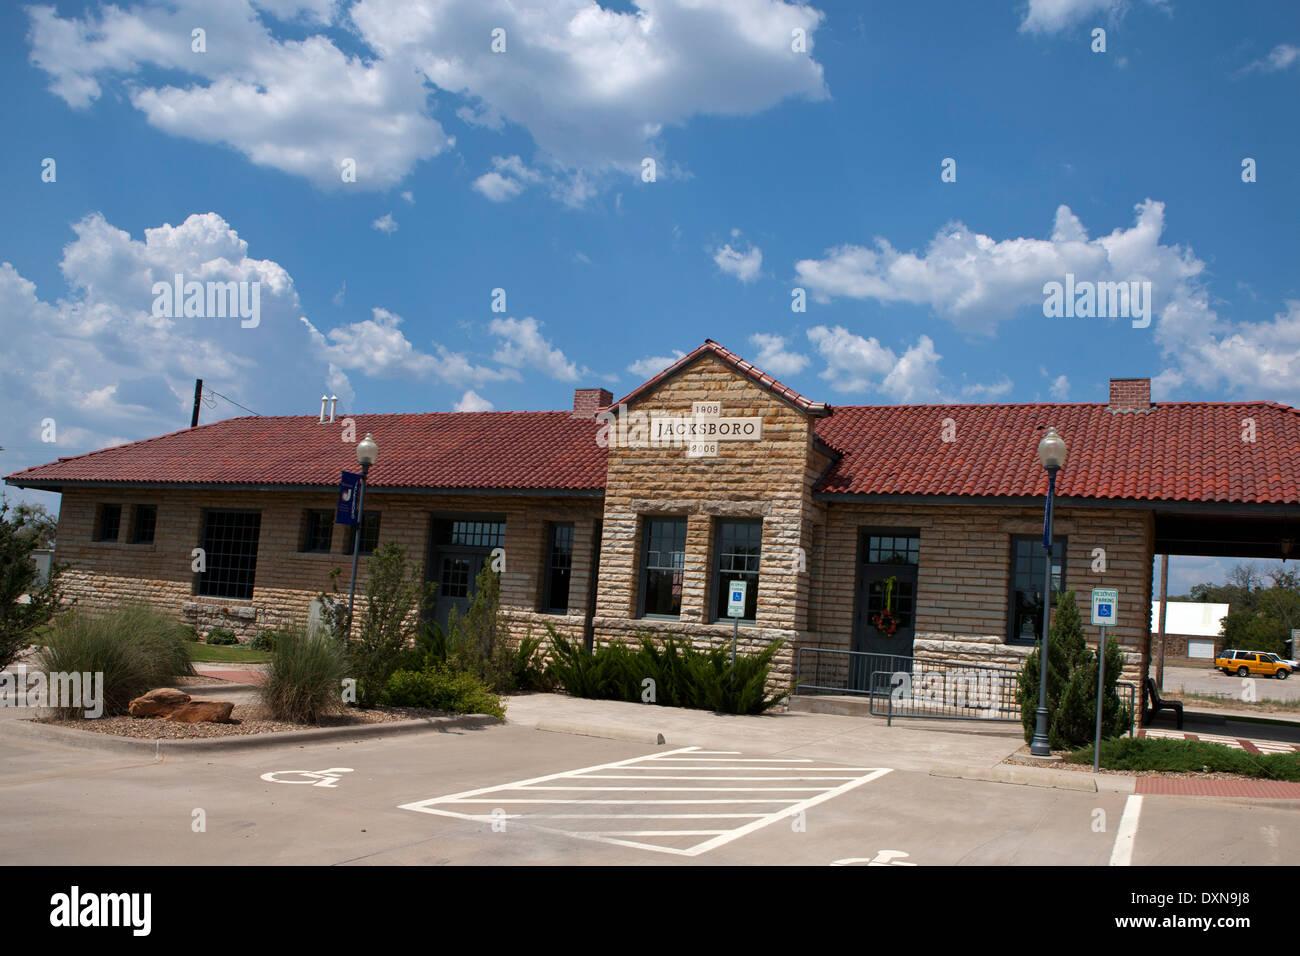 Visitors Center, Jacksboro, Texas, United States of America Stock Photo